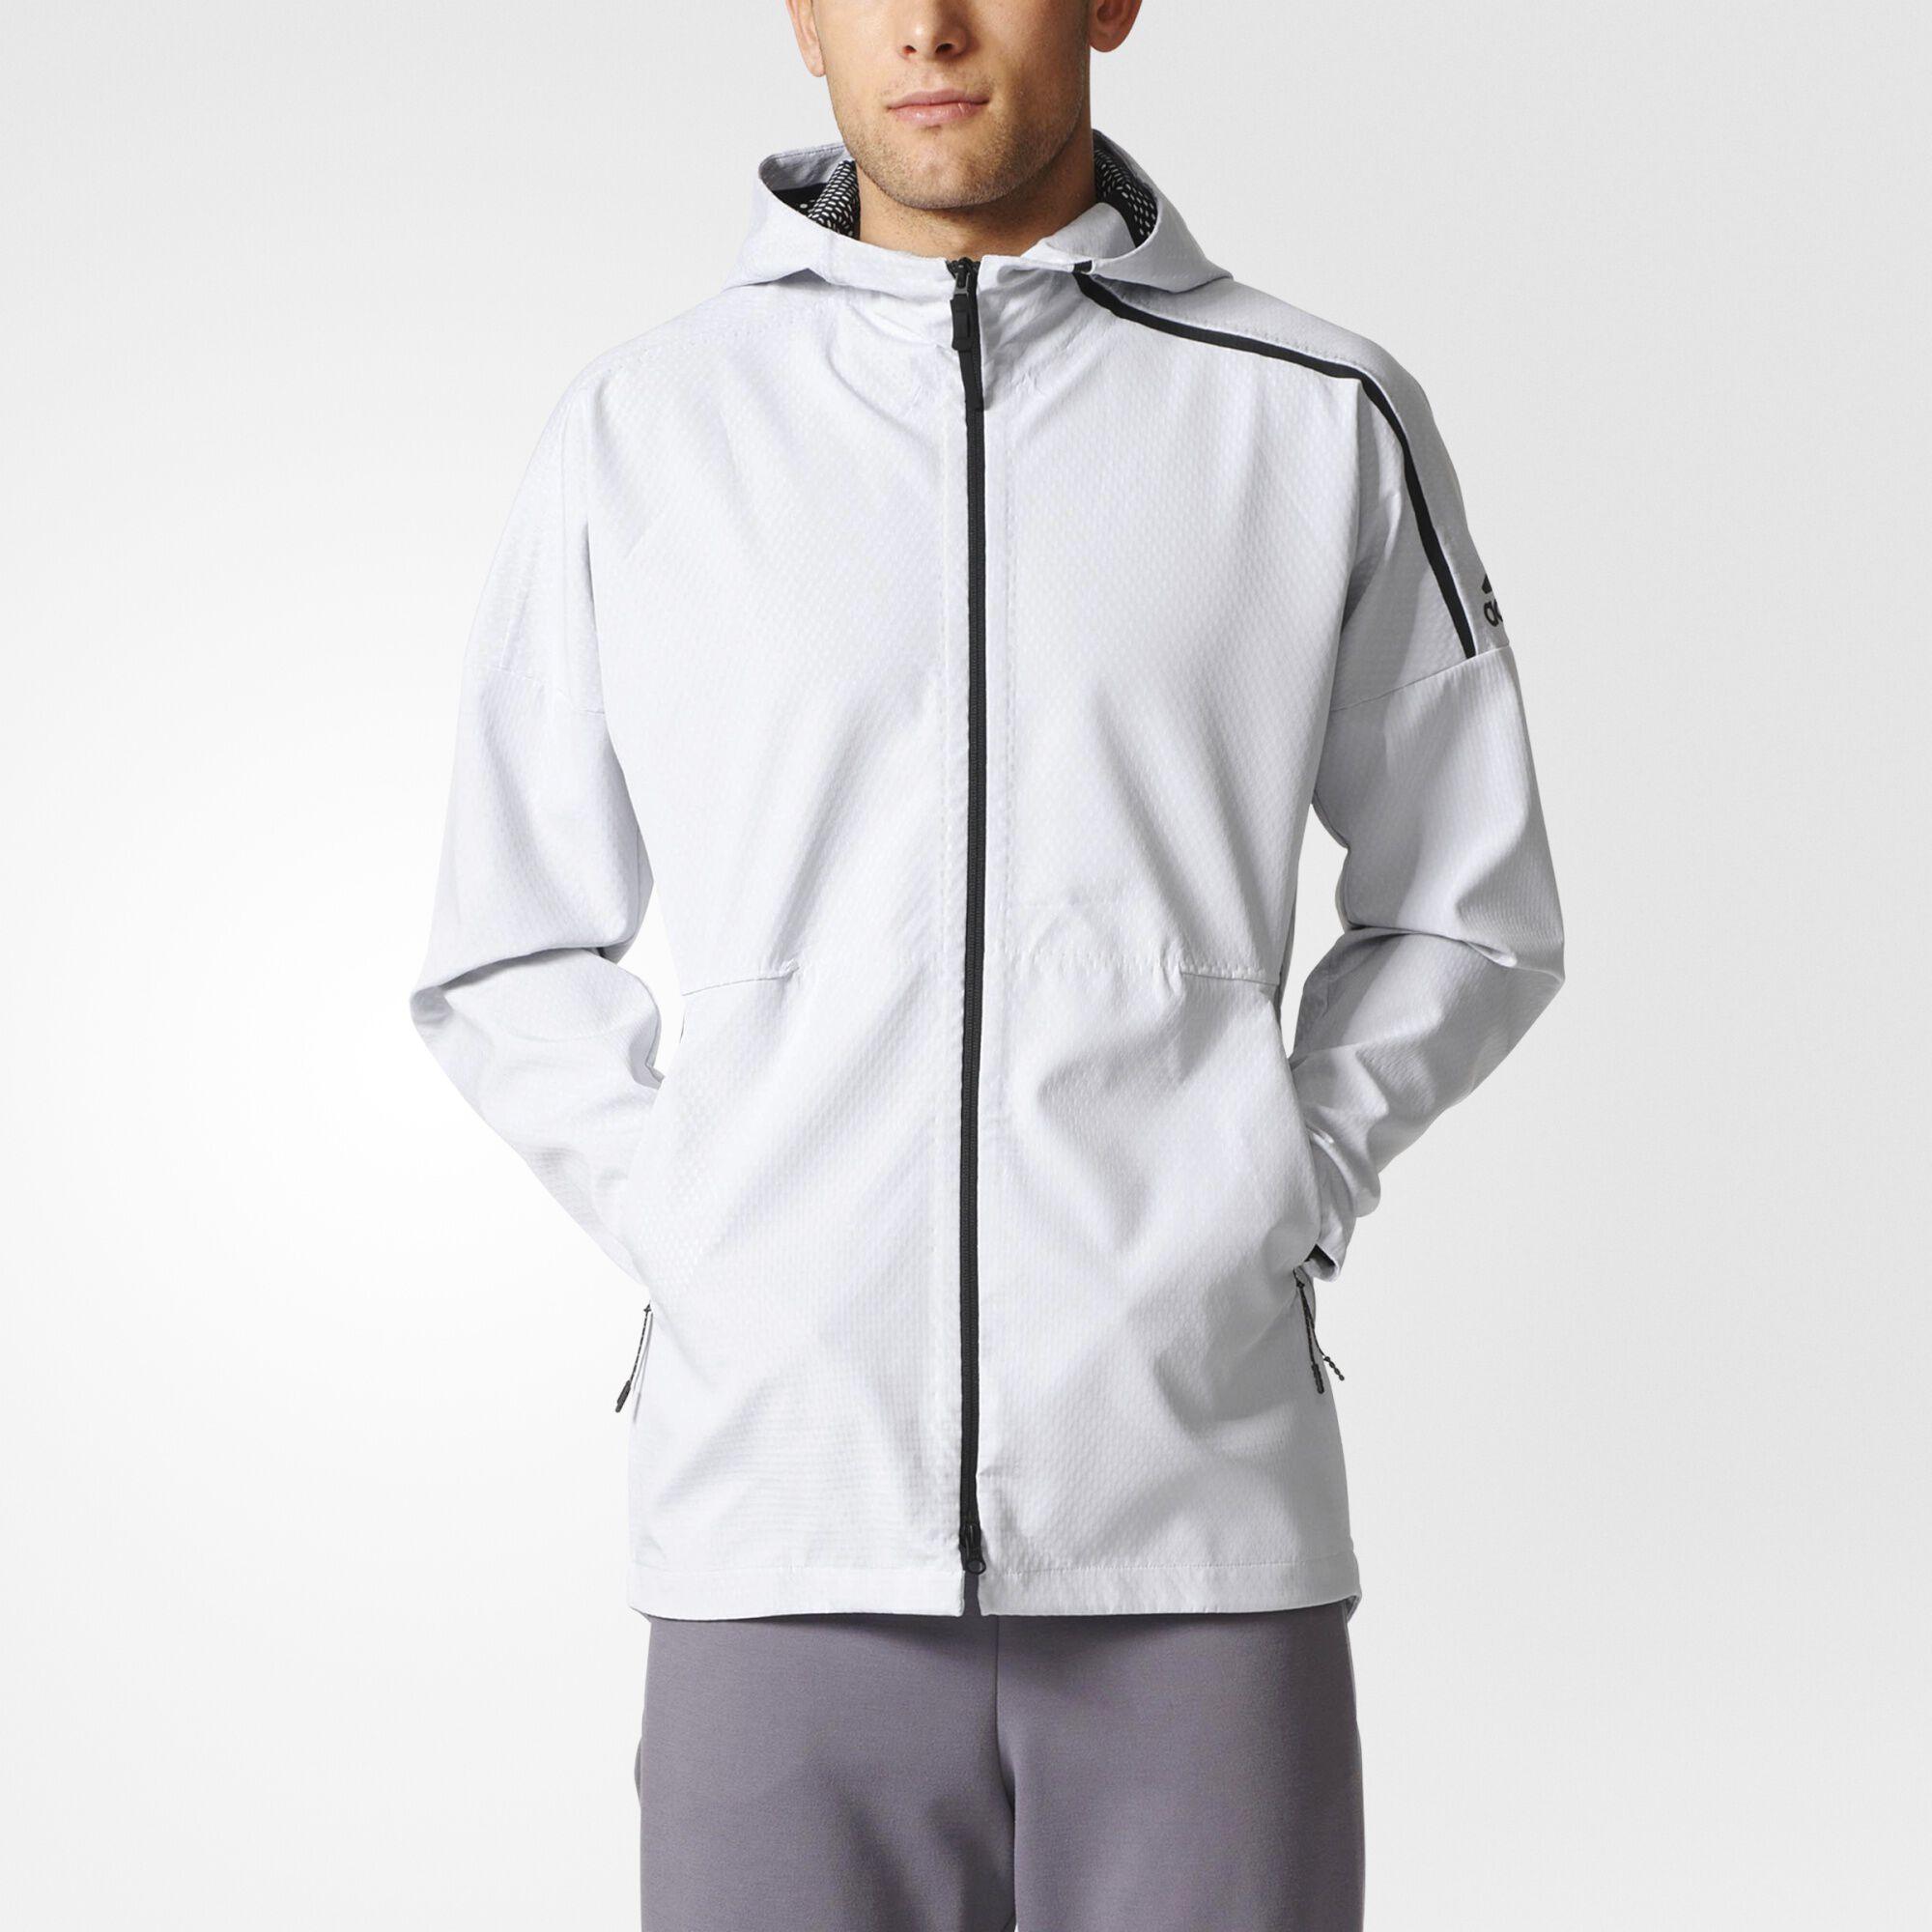 adidas Z.N.E. 90/10 Men's Jacket